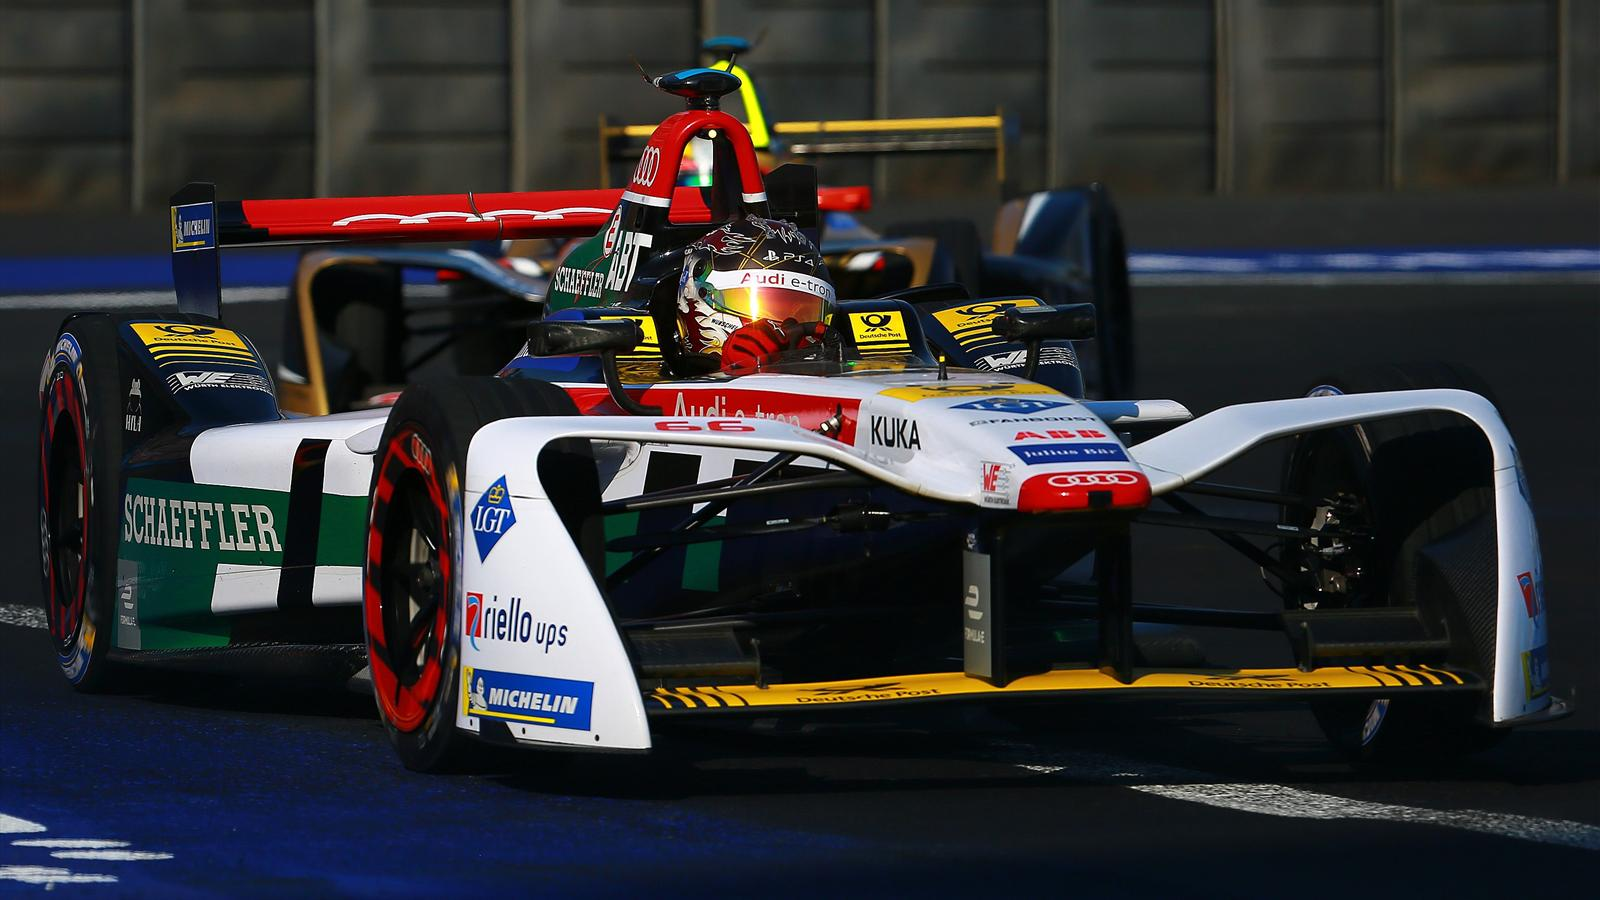 Formule e daniel abt audi s 39 impose jean eric vergne techeetah troisi me eprix de berlin - Formule vitesse de coupe ...